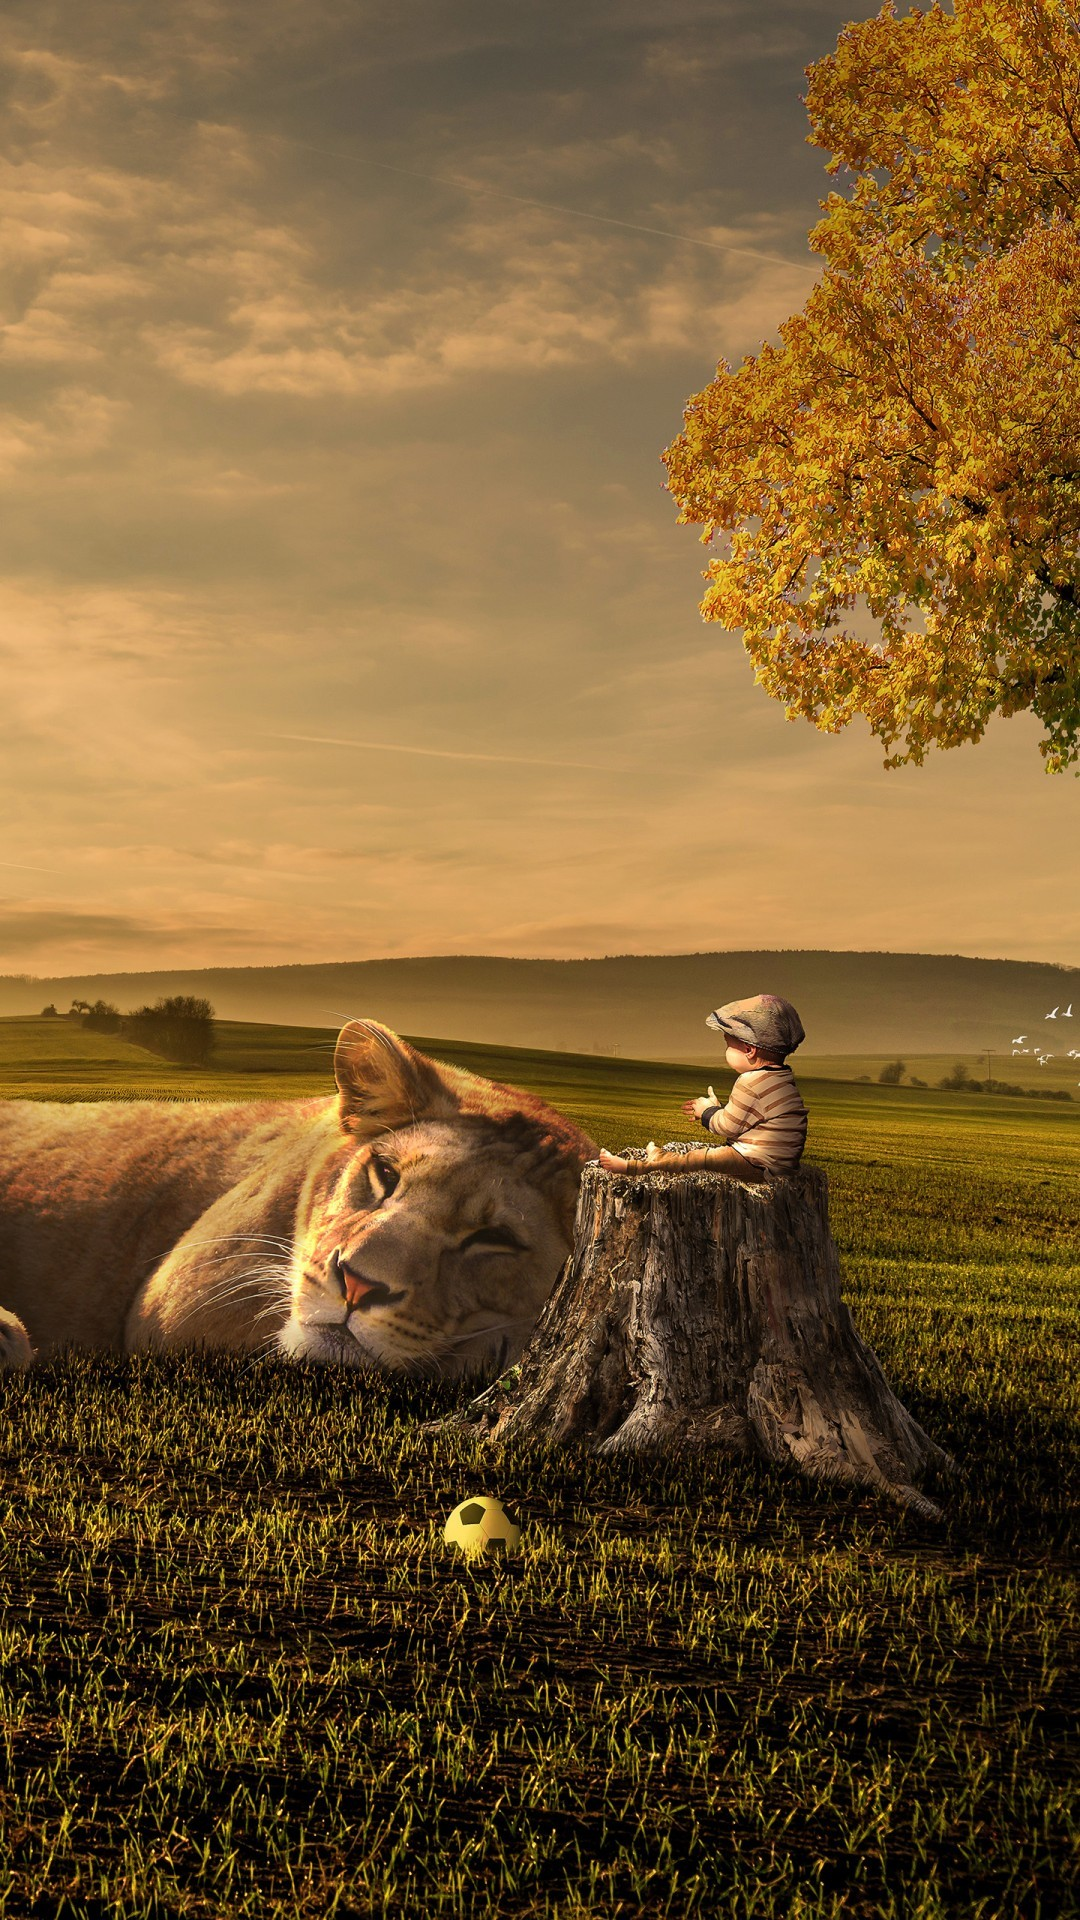 Free Sunset Kid Lion Dream phone wallpaper by xxfelecia